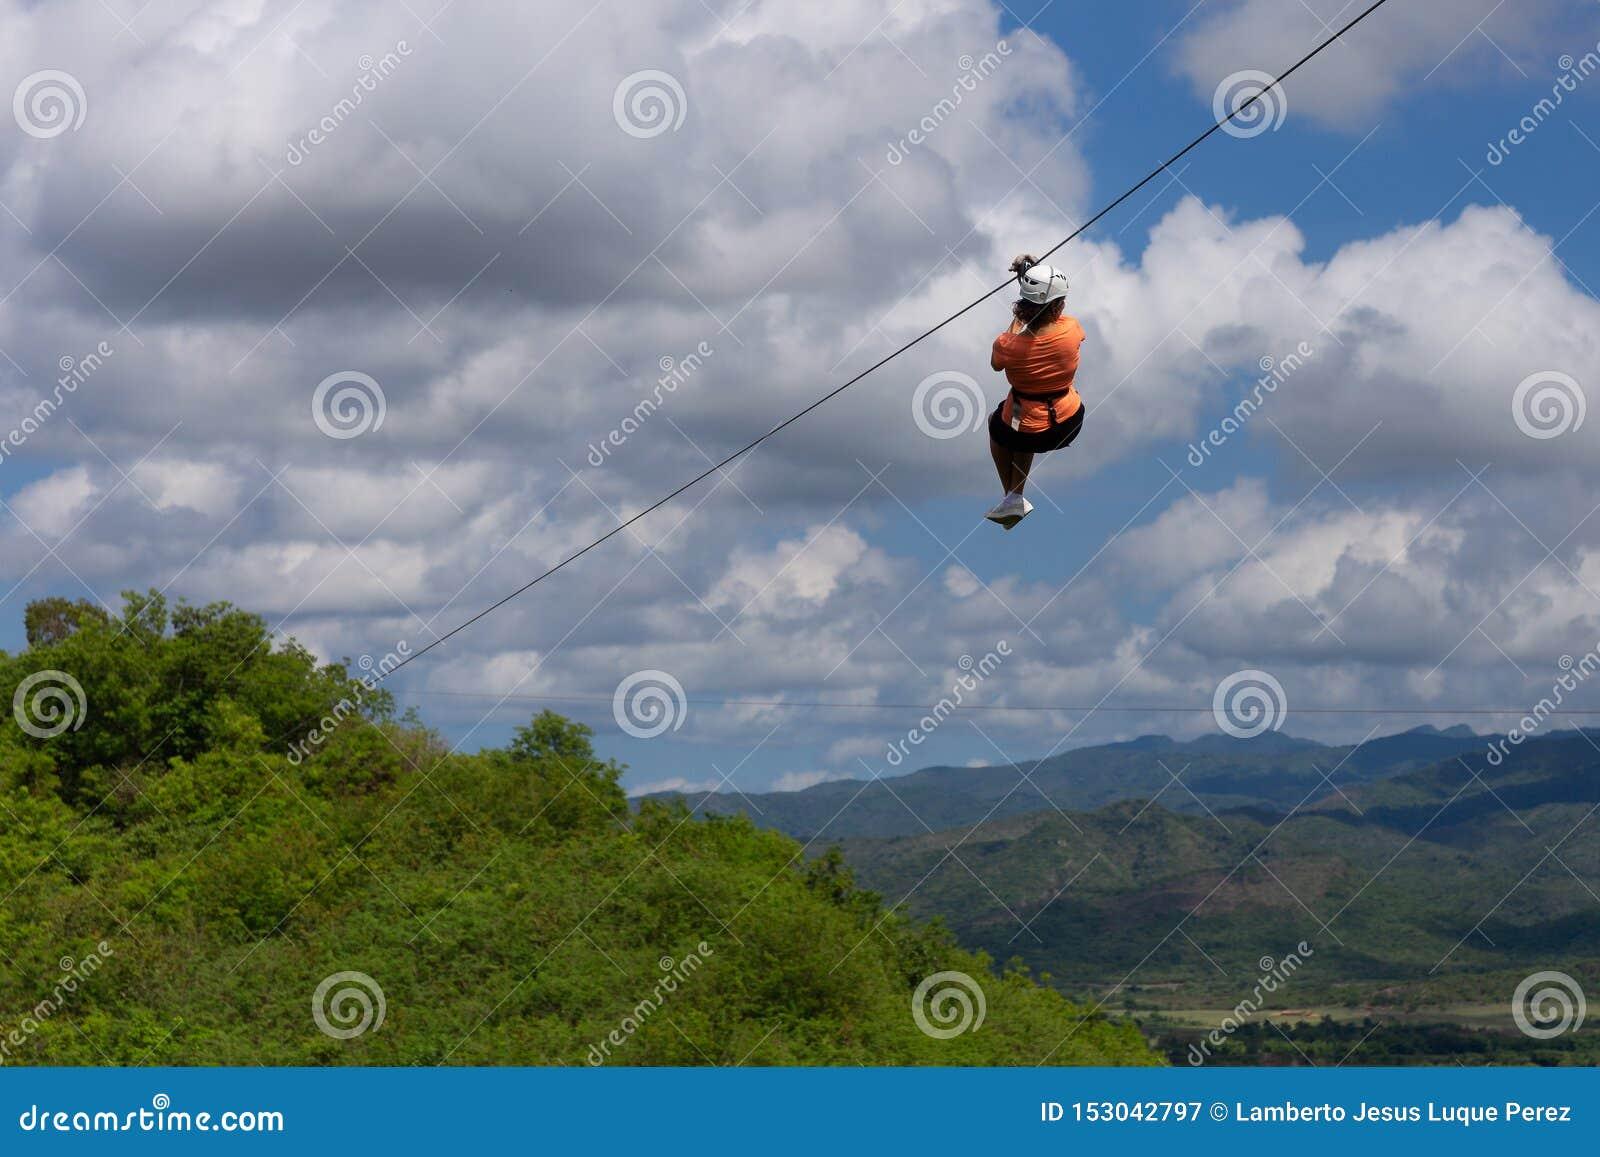 Woman riding in zip line in the Valley of Sugar Mills in Trinidad Cuba